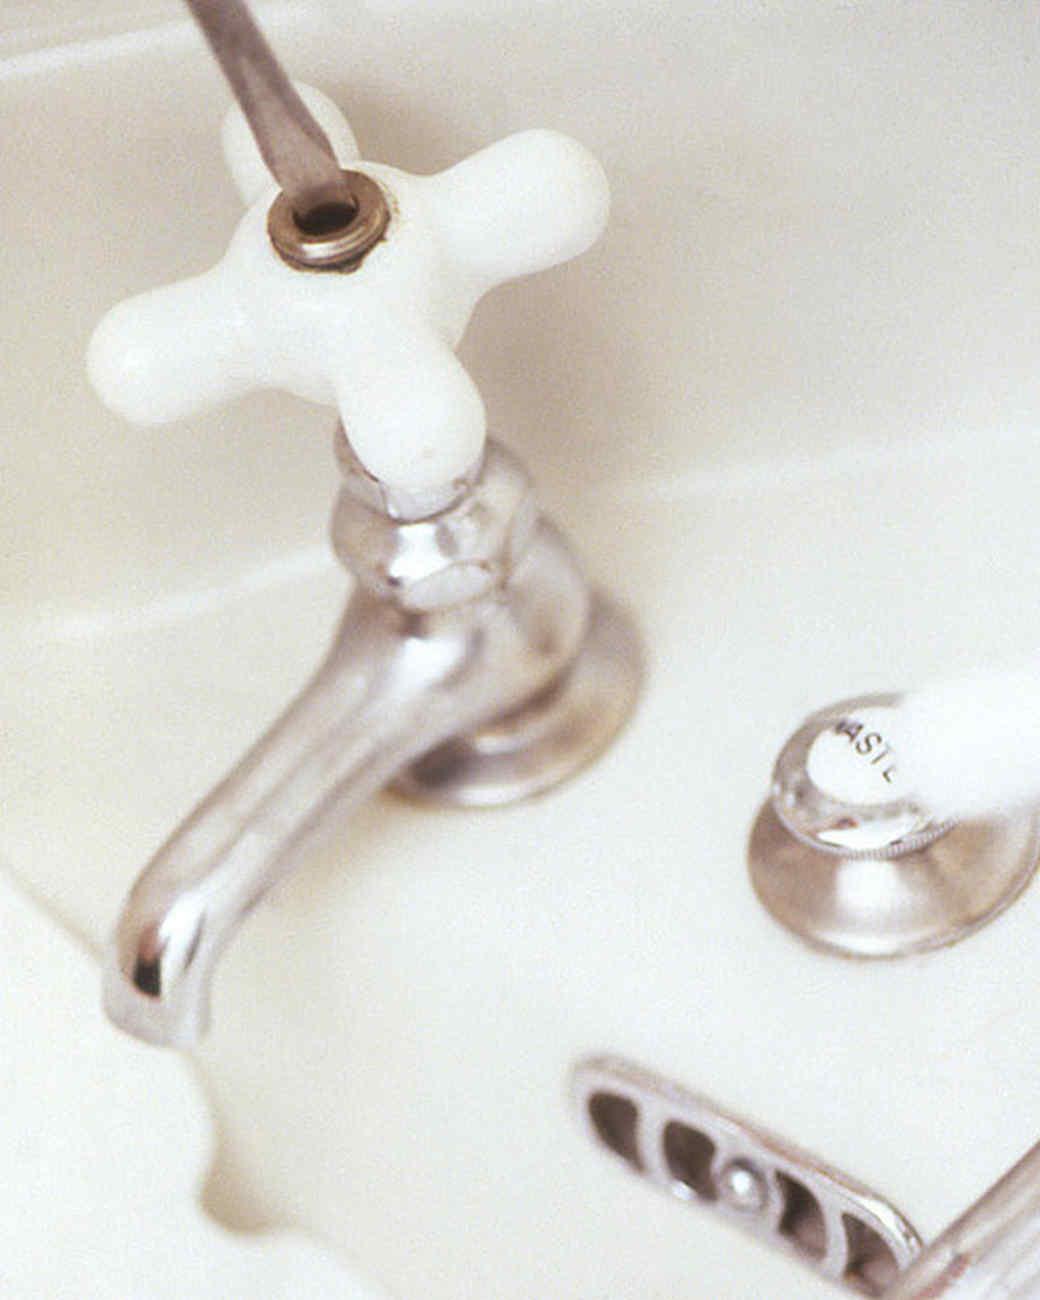 msl_0296_plumbing_reassemble.jpg